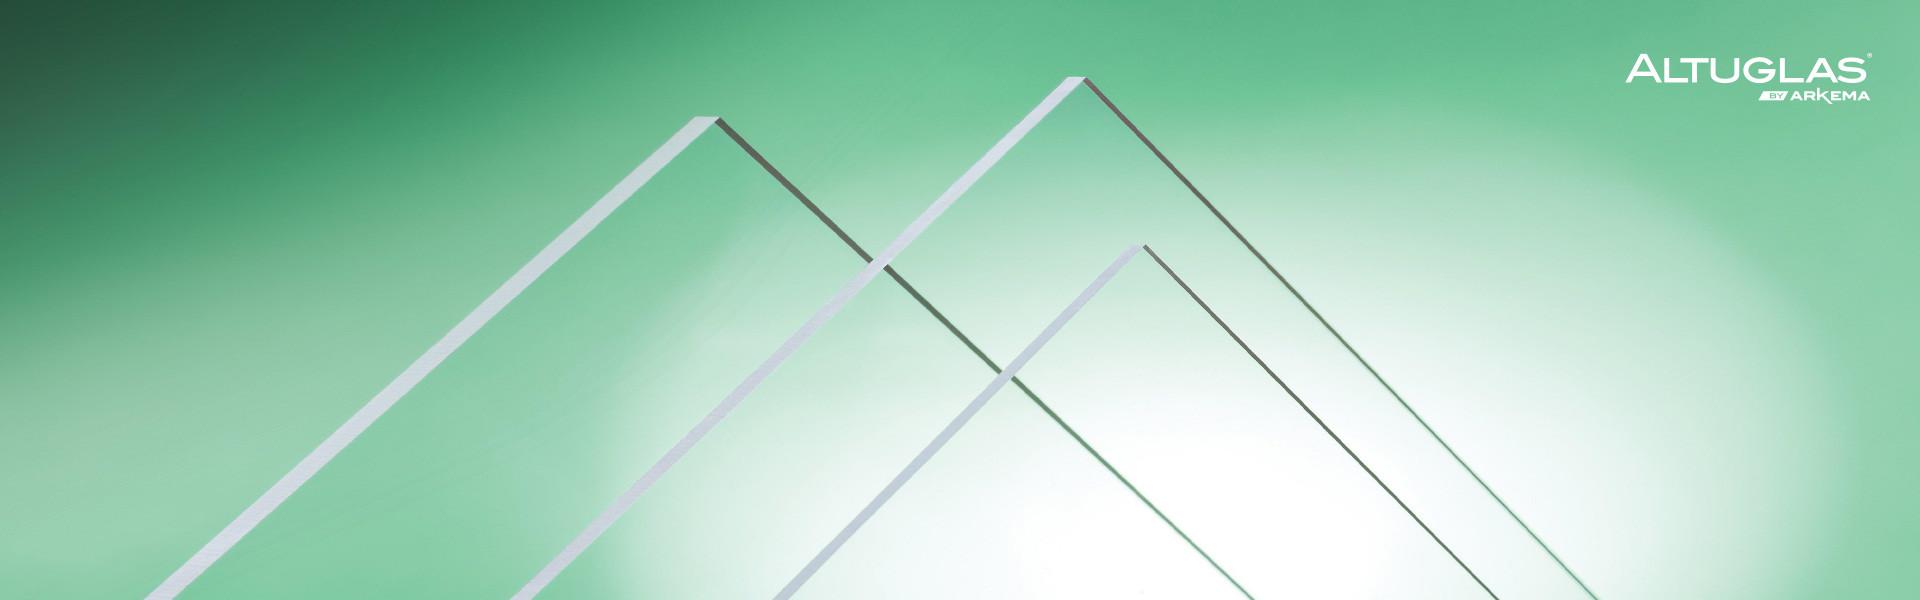 Знижка на литий прозорий акрил ALTUGLAS 4 мм – 41,53 € за м.кв